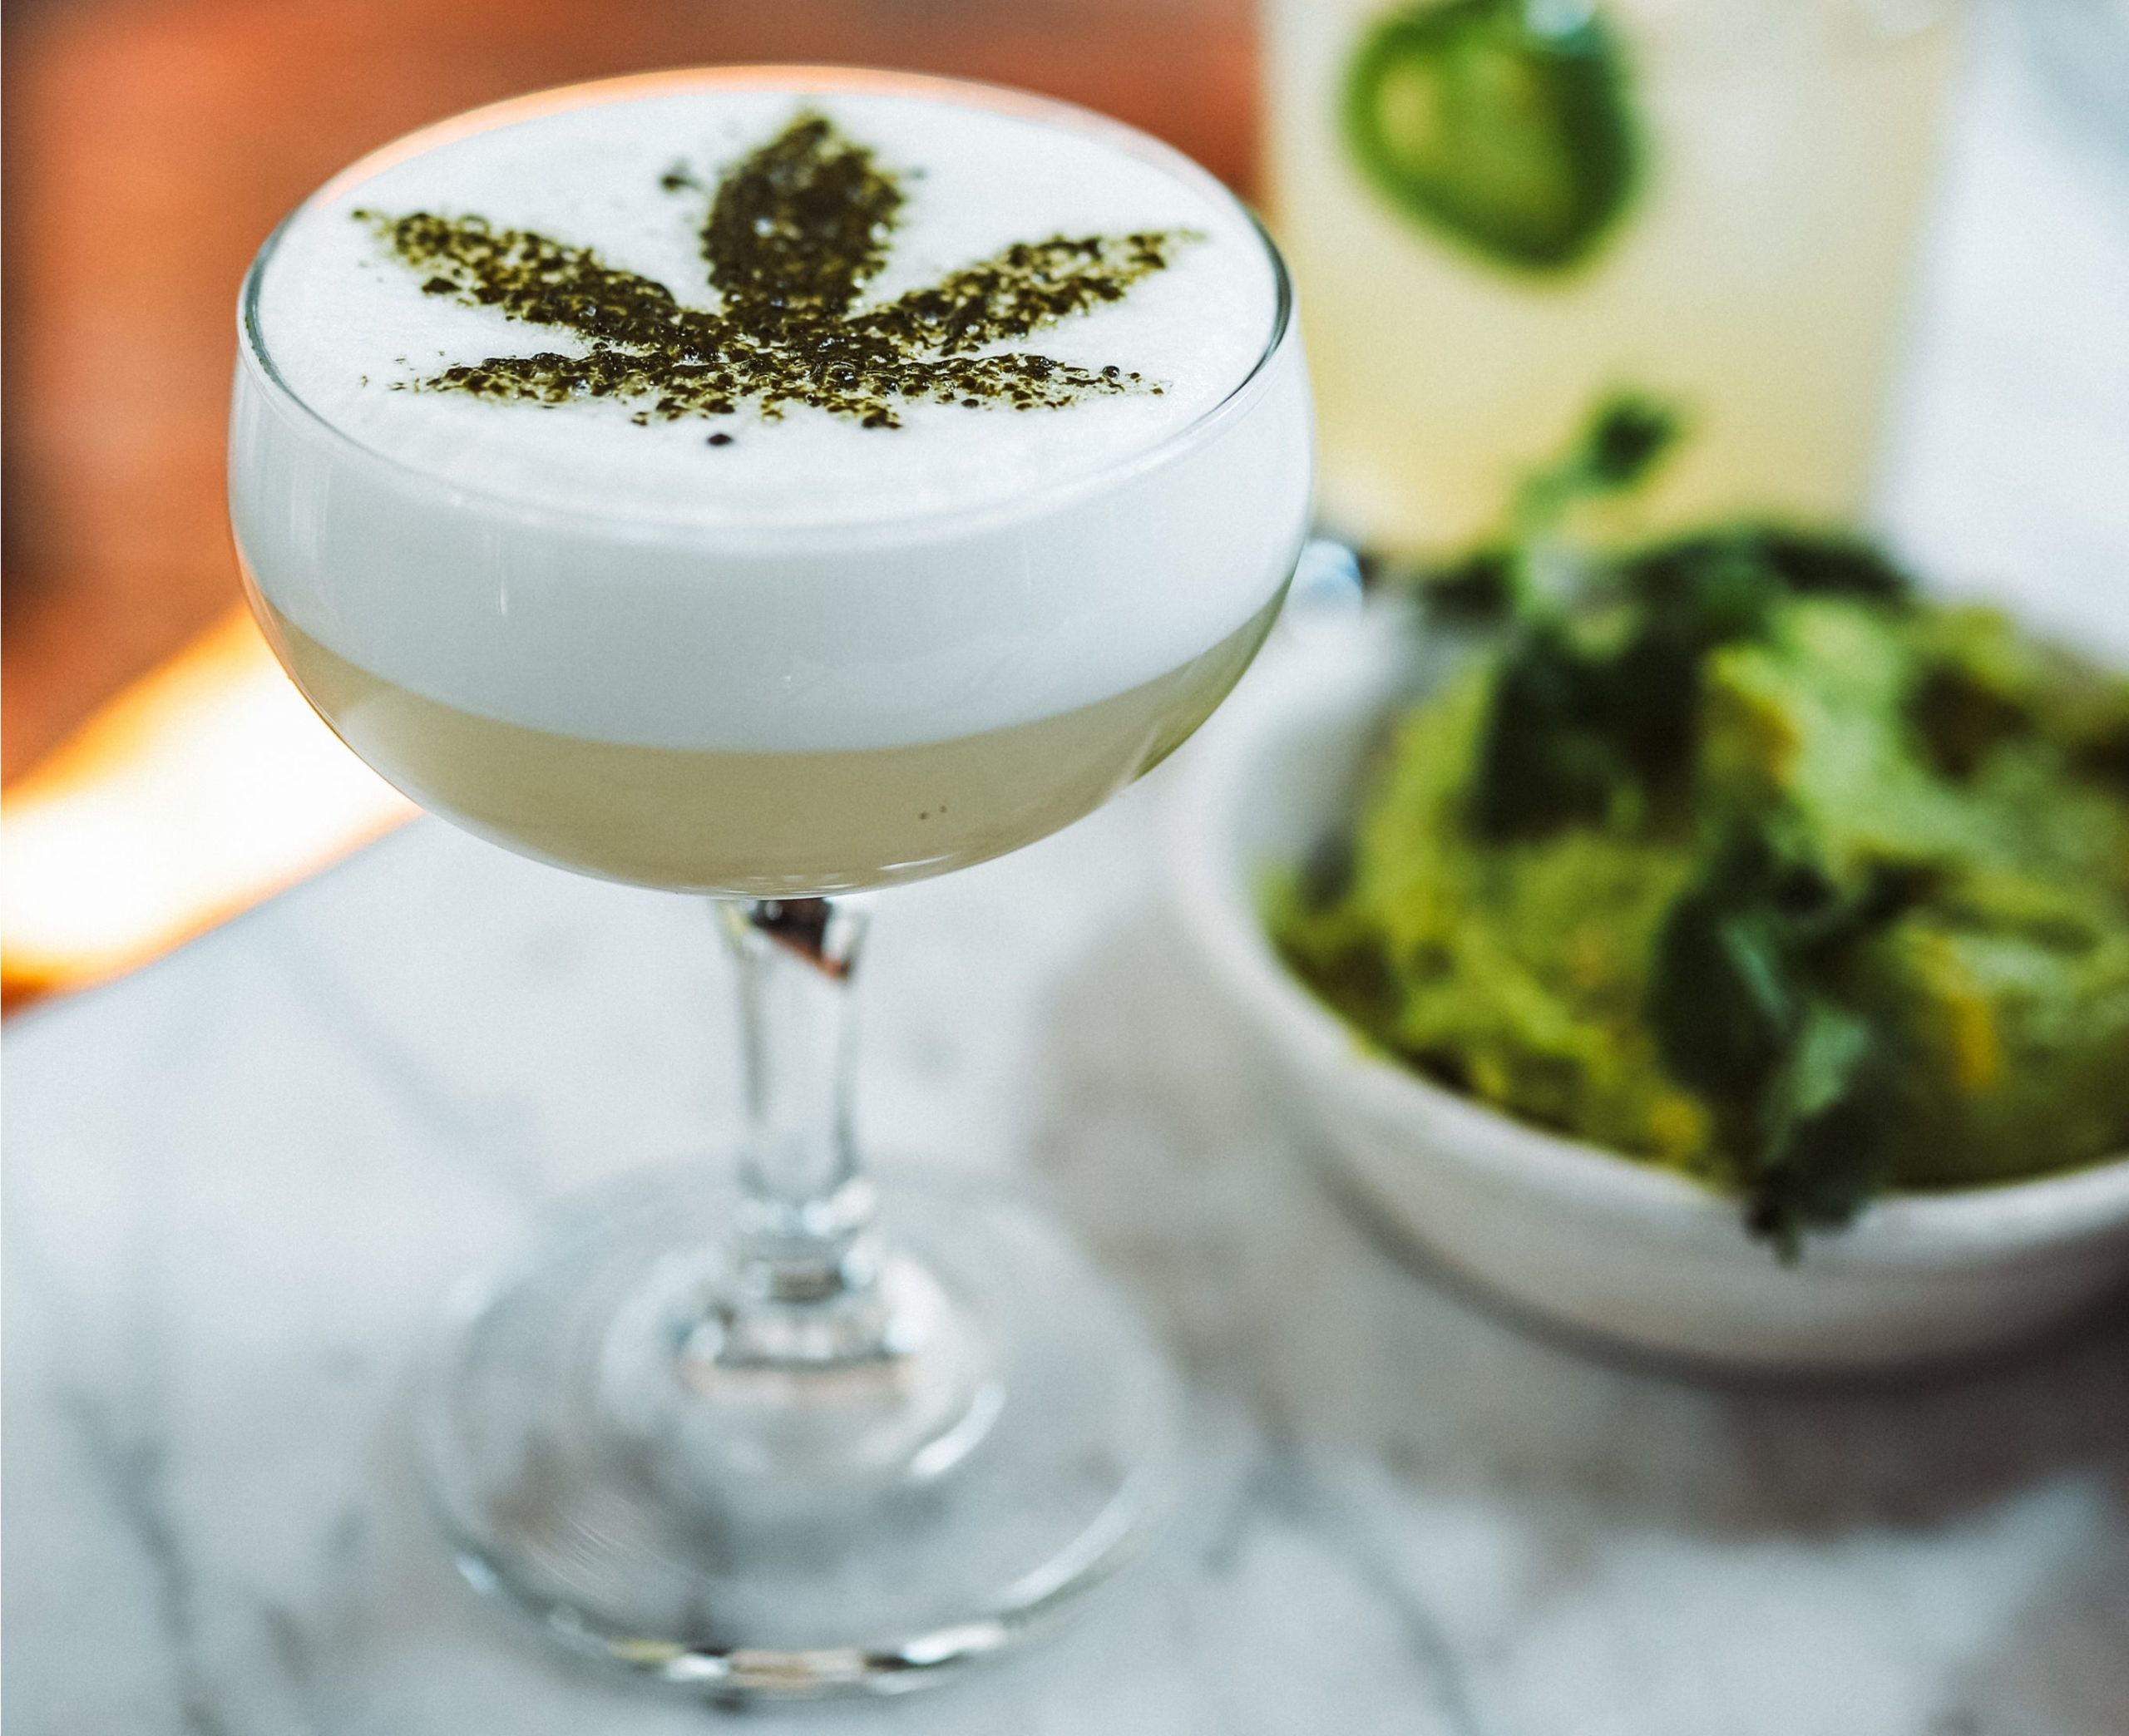 California marijuana alcohol businesses, California nixes marijuana- and hemp-infused alcoholic beverages